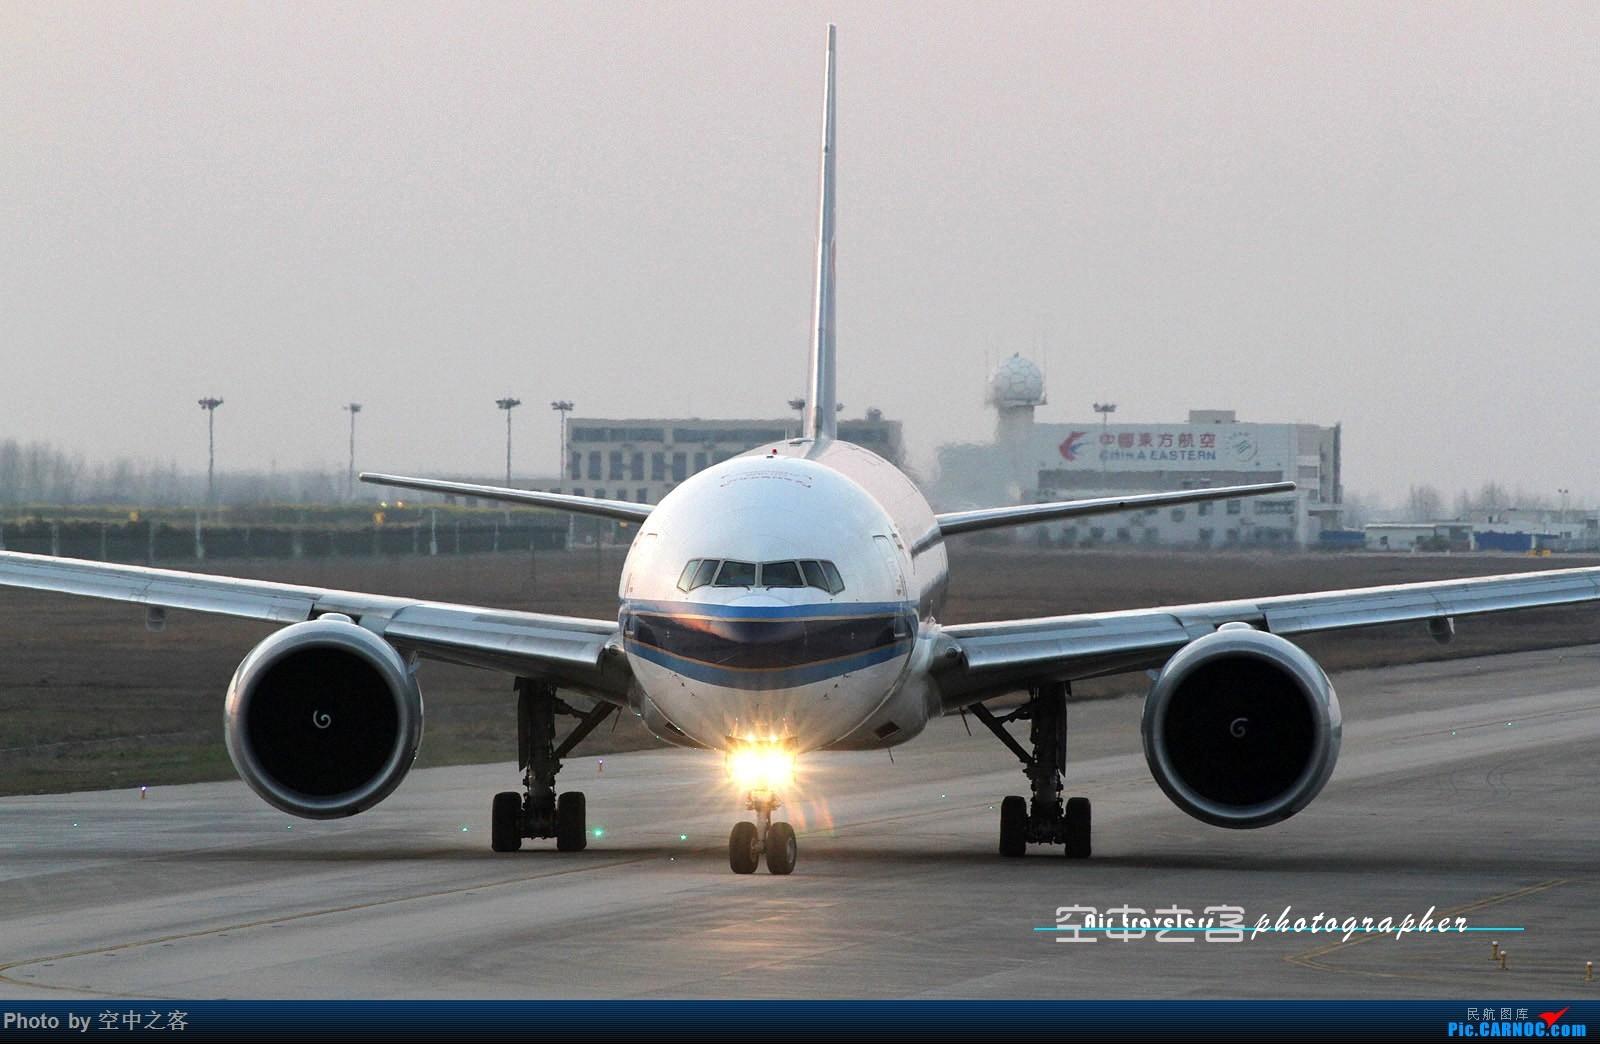 Re:[原创][合肥飞友会·霸都打机队]空中之客出品 大佬在利马 我在新机场看南货航大飞机来加油(2) BOEING 777-200 B-2072 合肥新桥国际机场